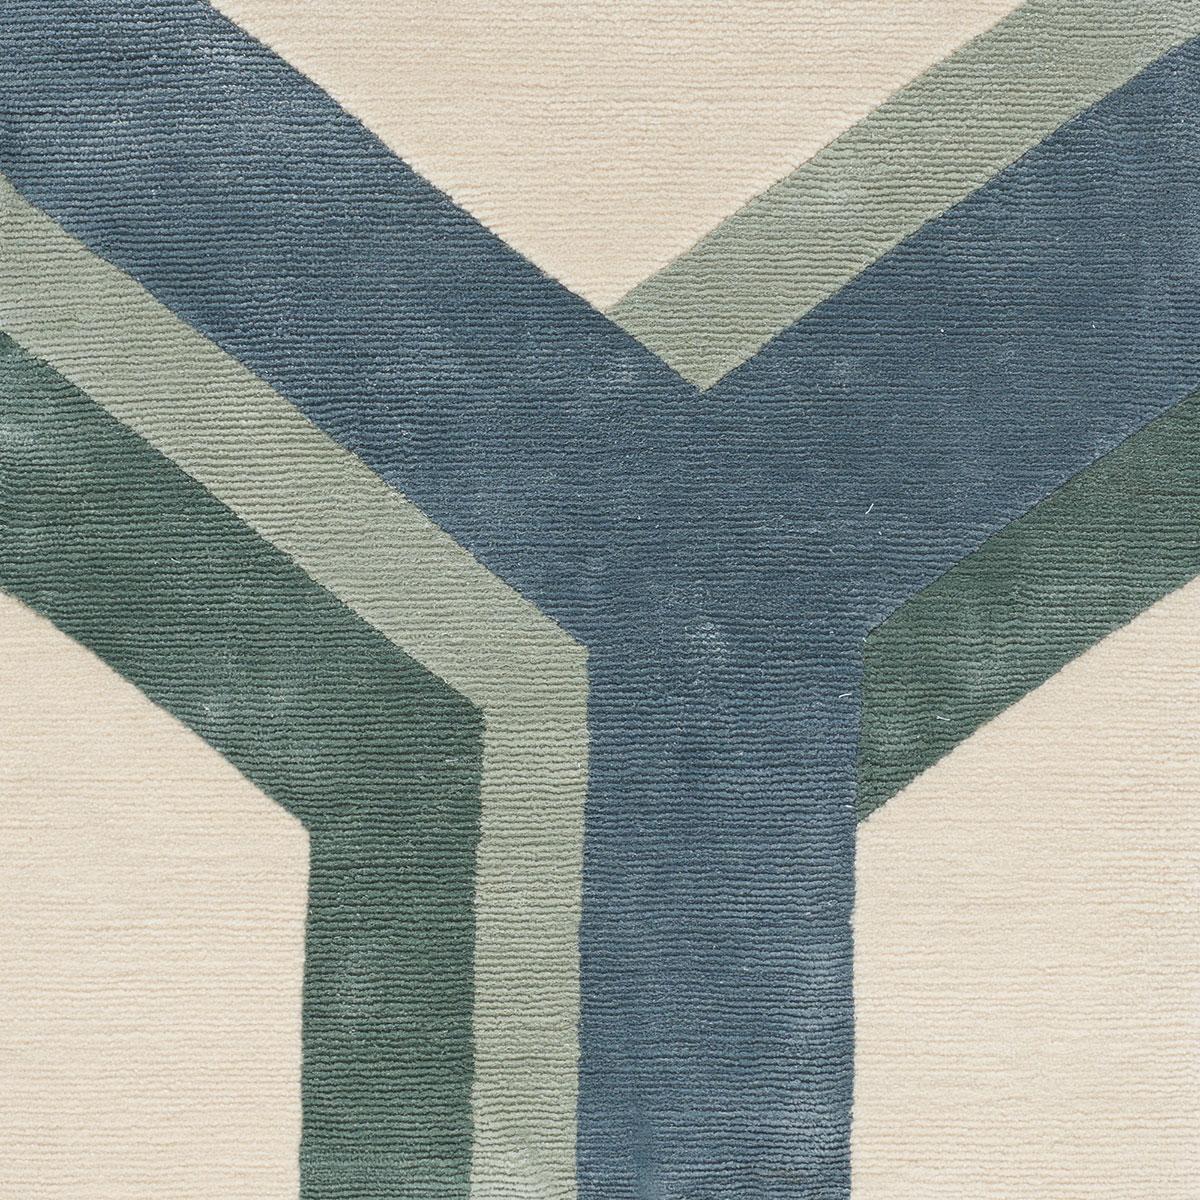 vitus_wool-silk_hand-knotted_patterson-flynn-martin_pfm